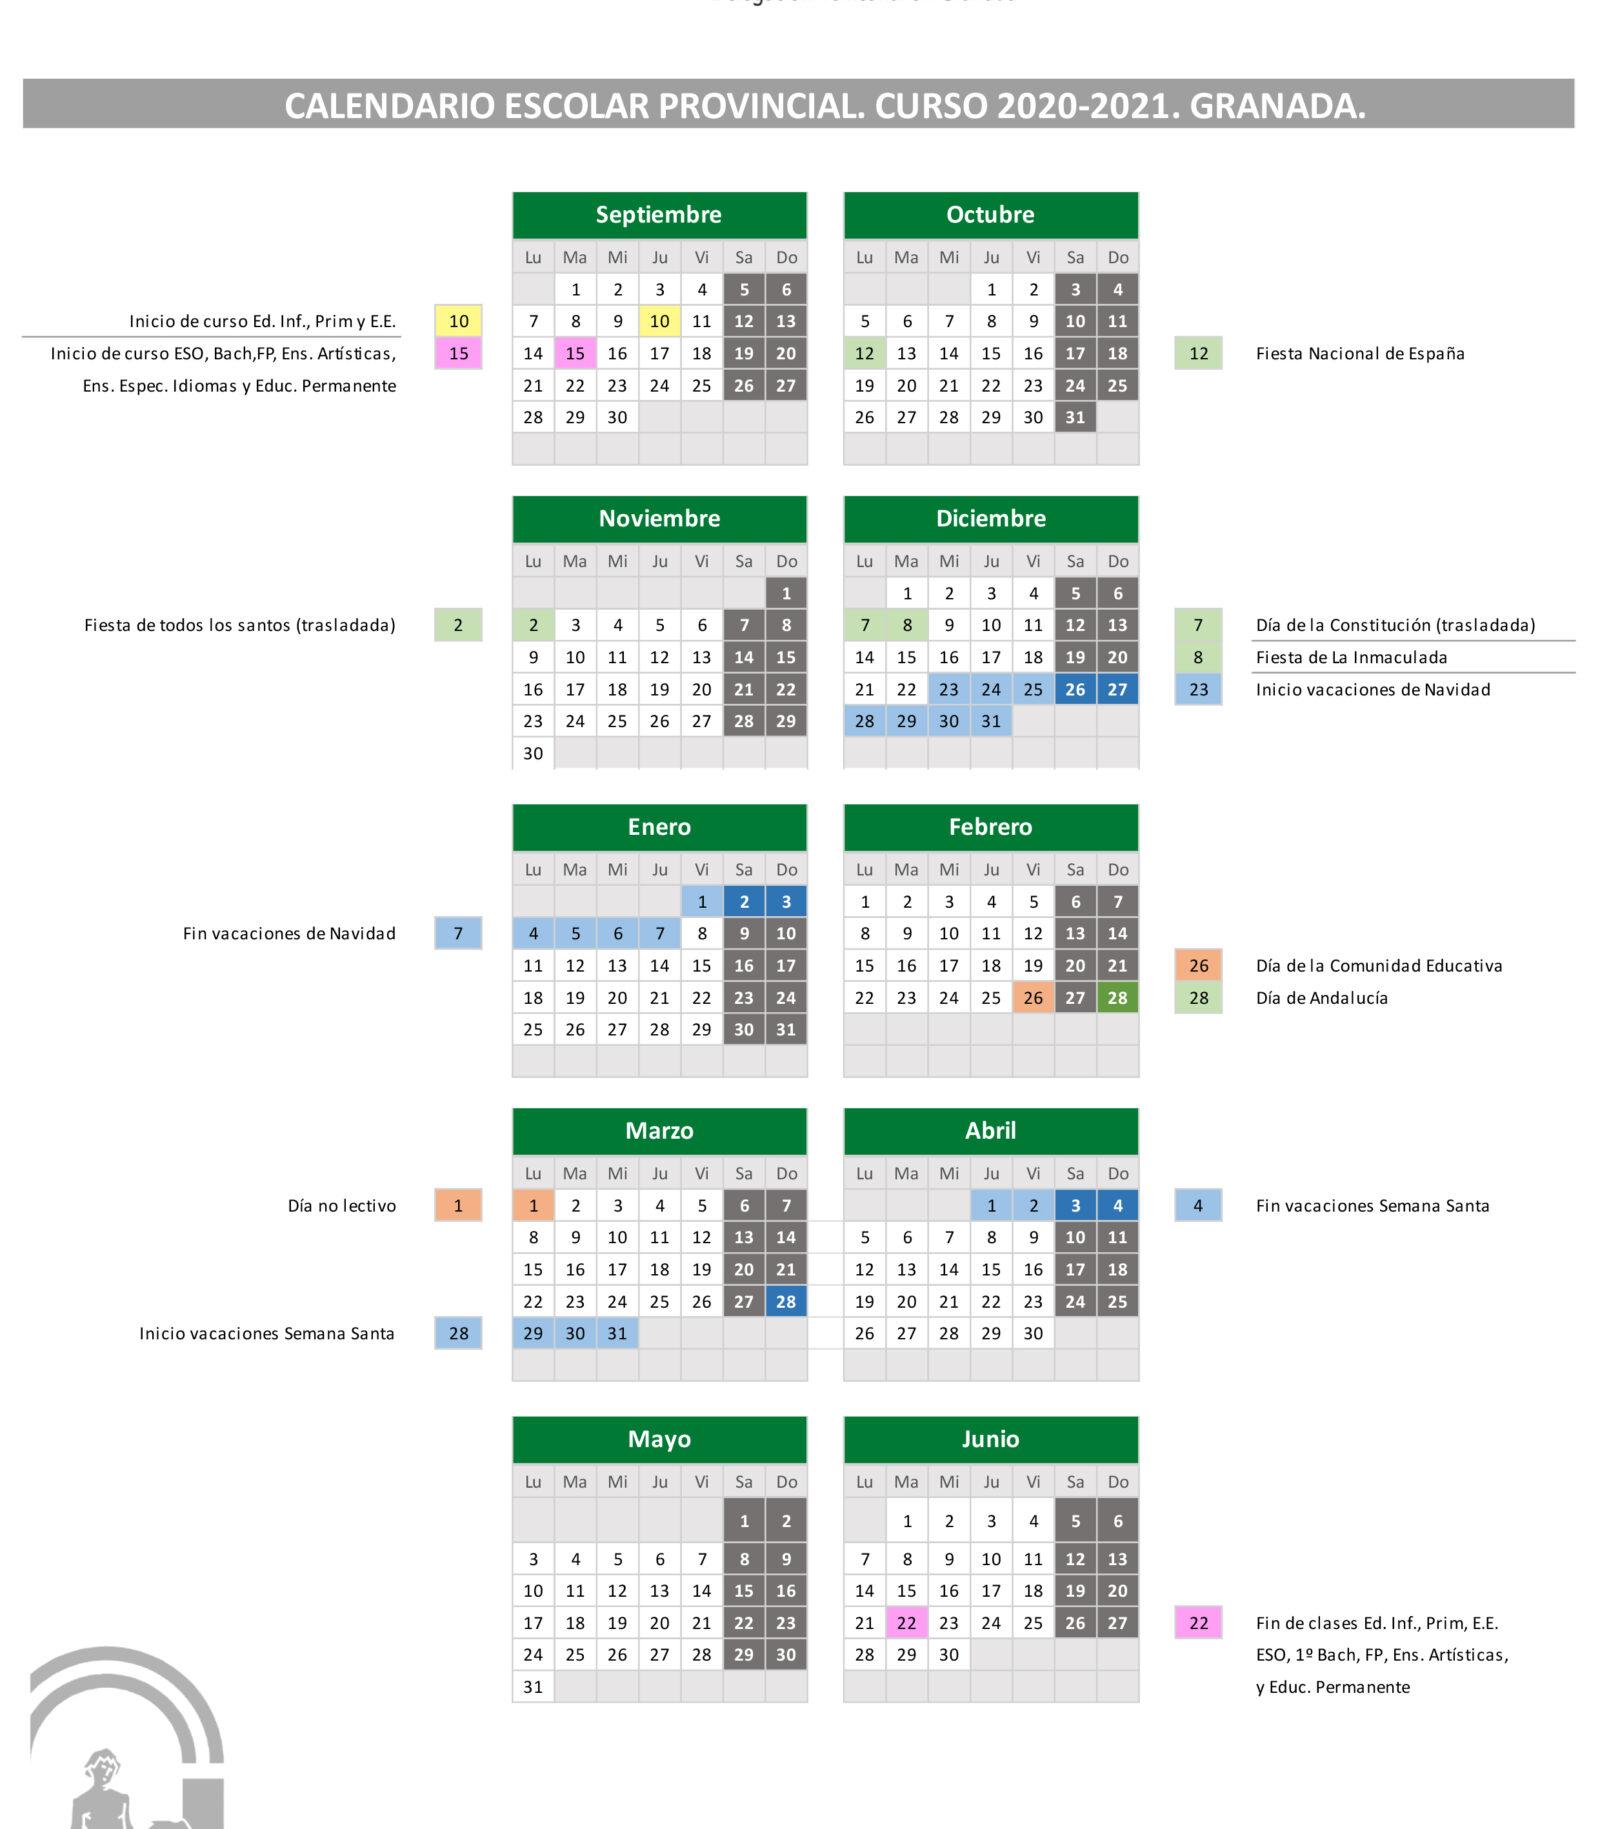 Calendario Escolar Granada 2020-21